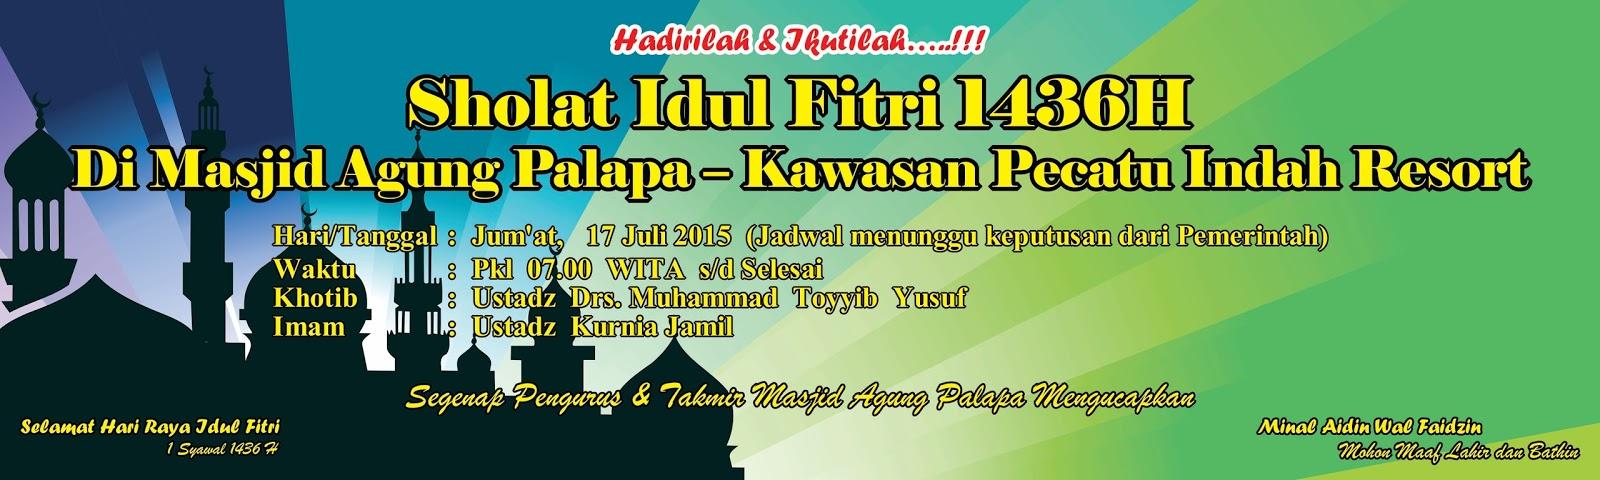 Banner Sholat Idul Fitri H